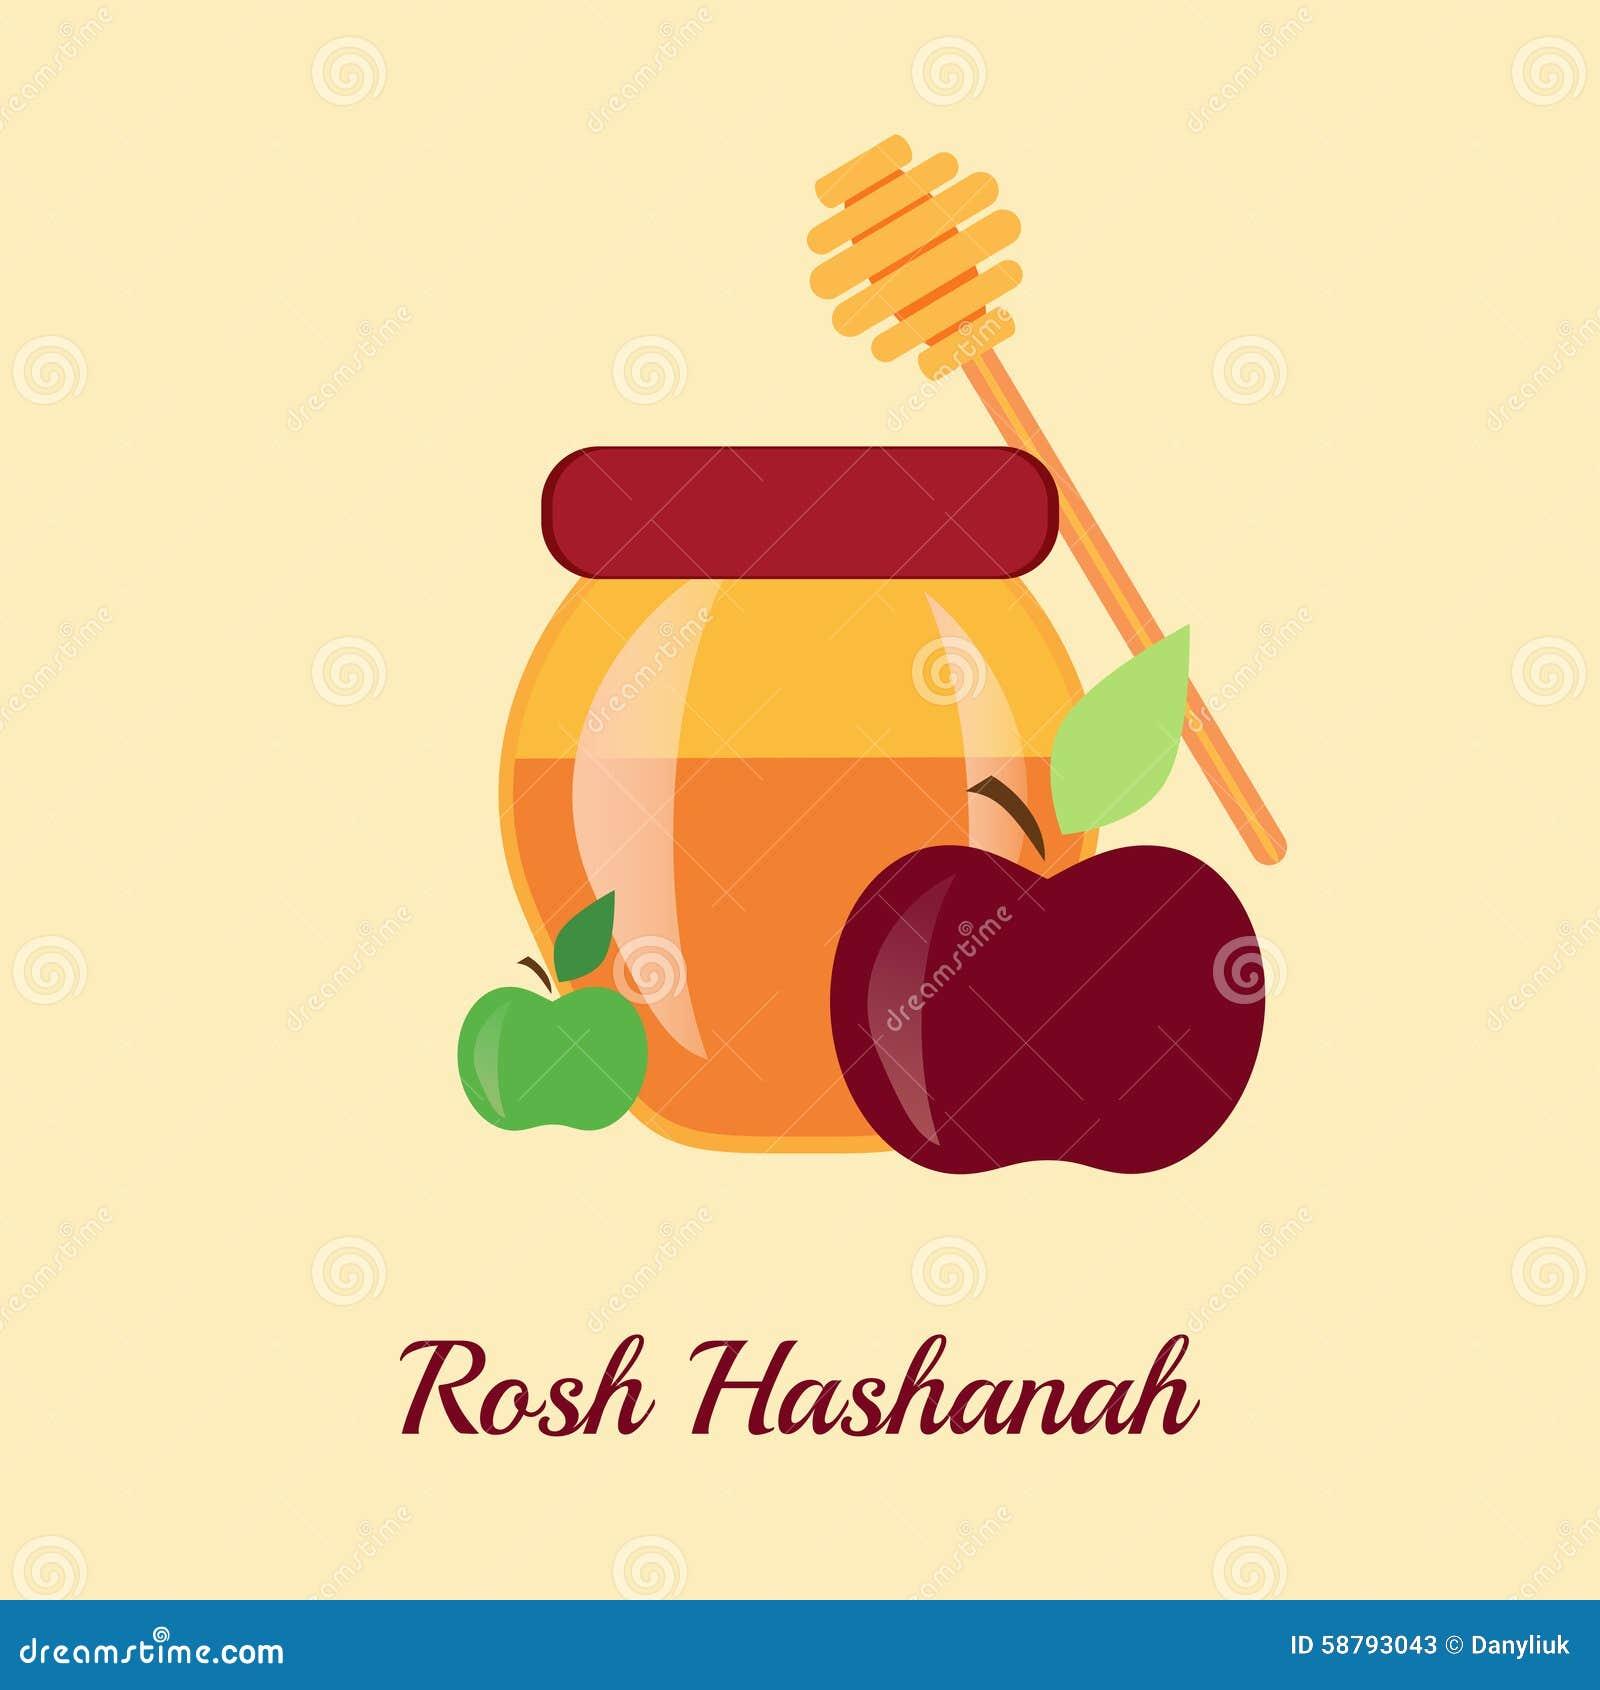 Greeting Card Design For Jewish New Year Rosh Hashanah Stock